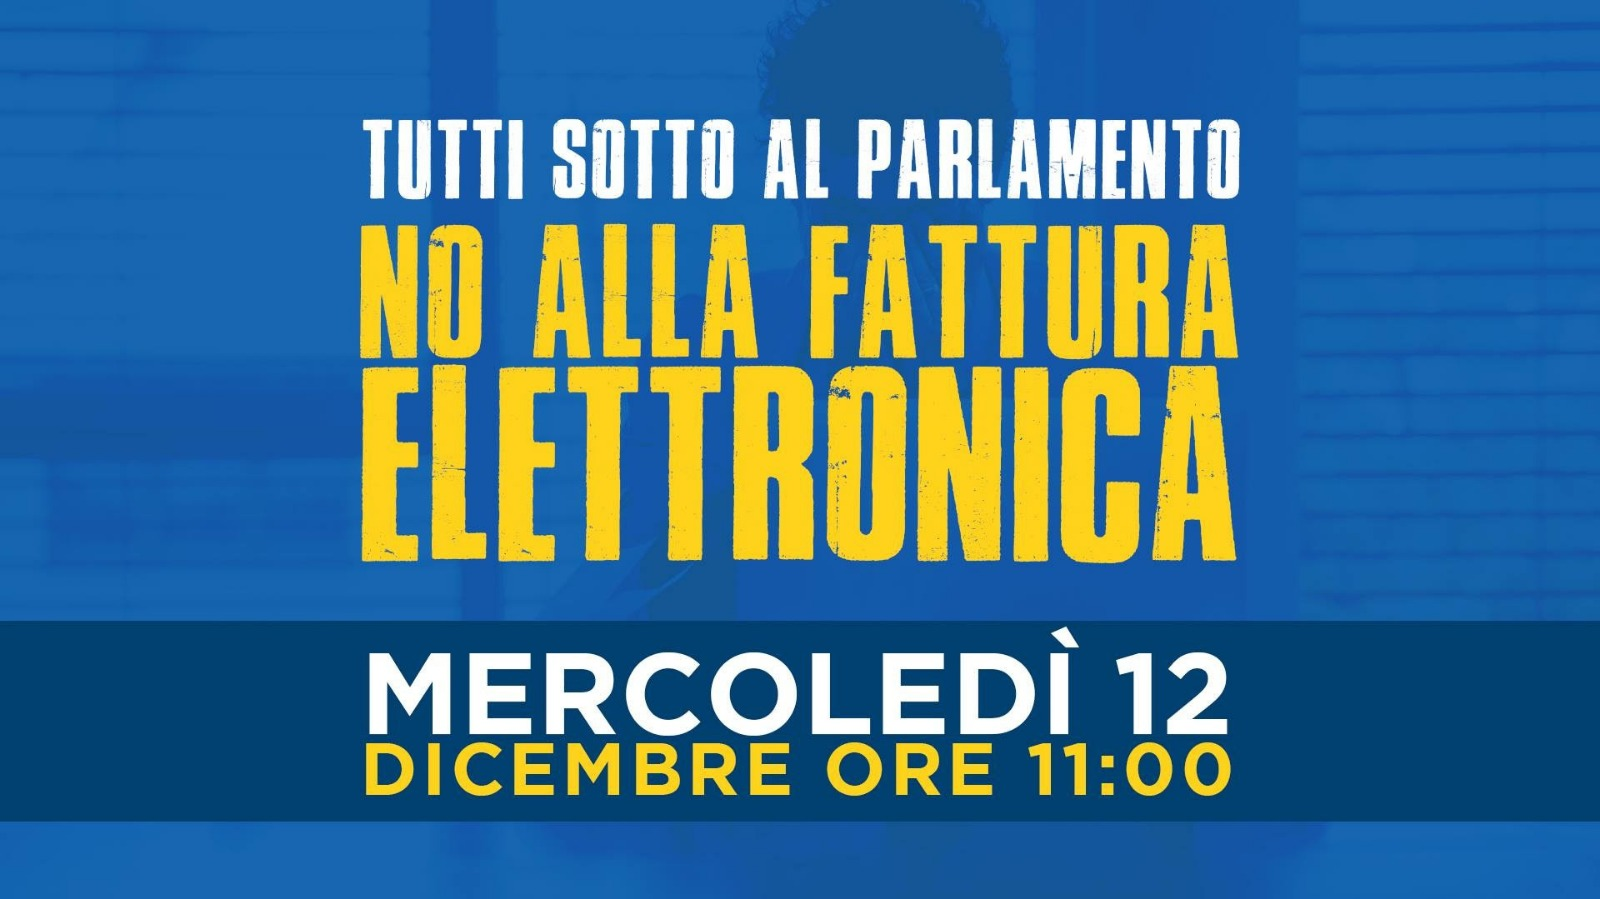 #noFatturaElettronica